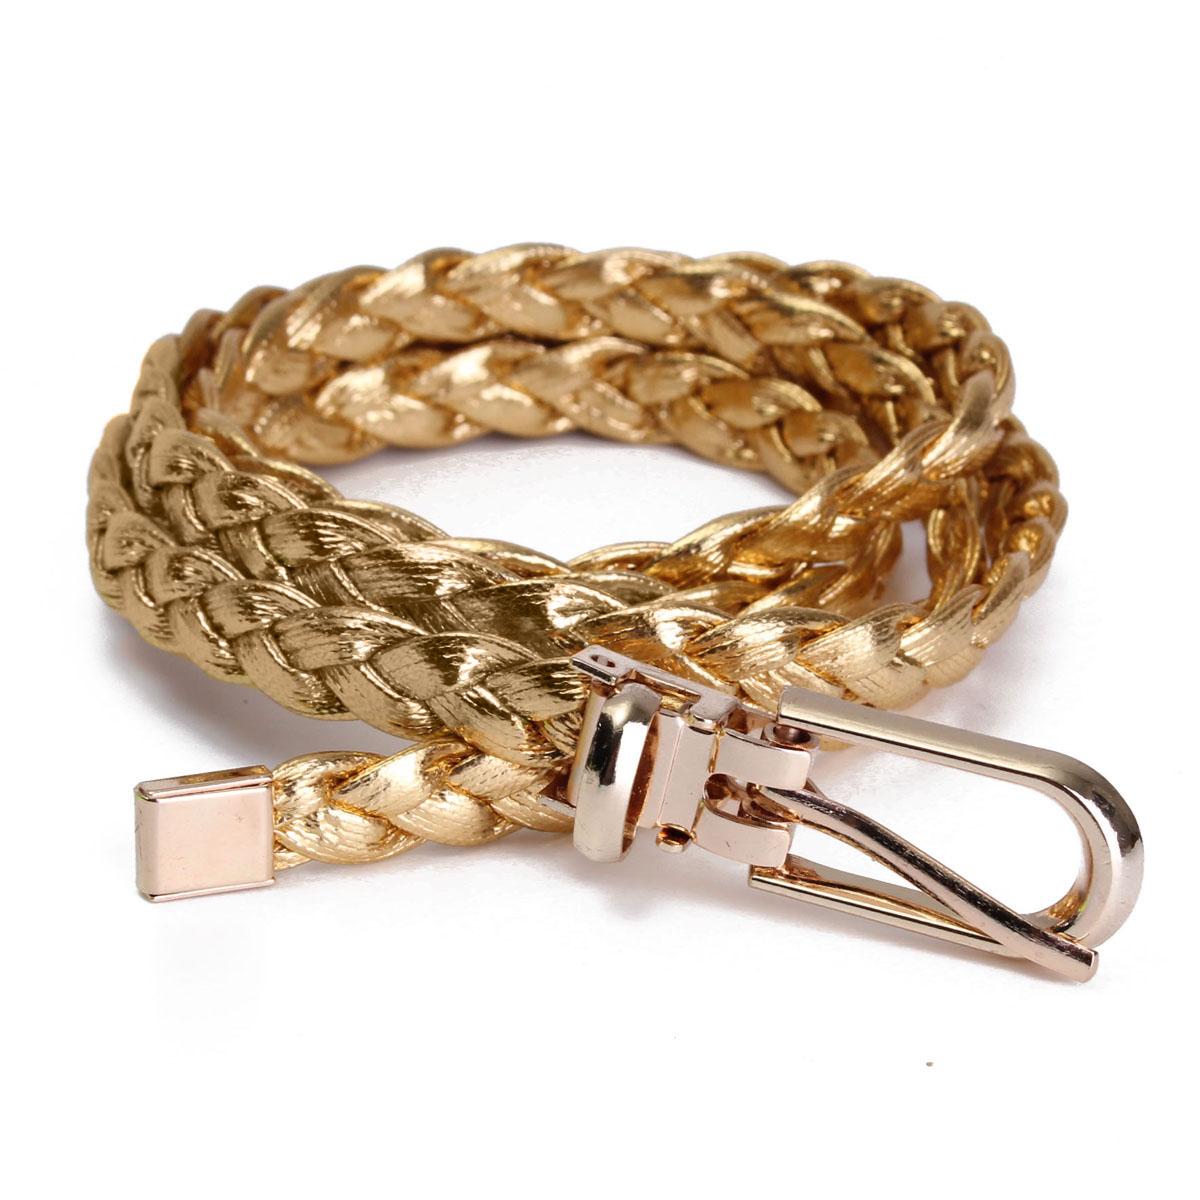 Women Simple Braided PU Leather Narrow Thin Buckle Strap Waist Belt Waistband UK